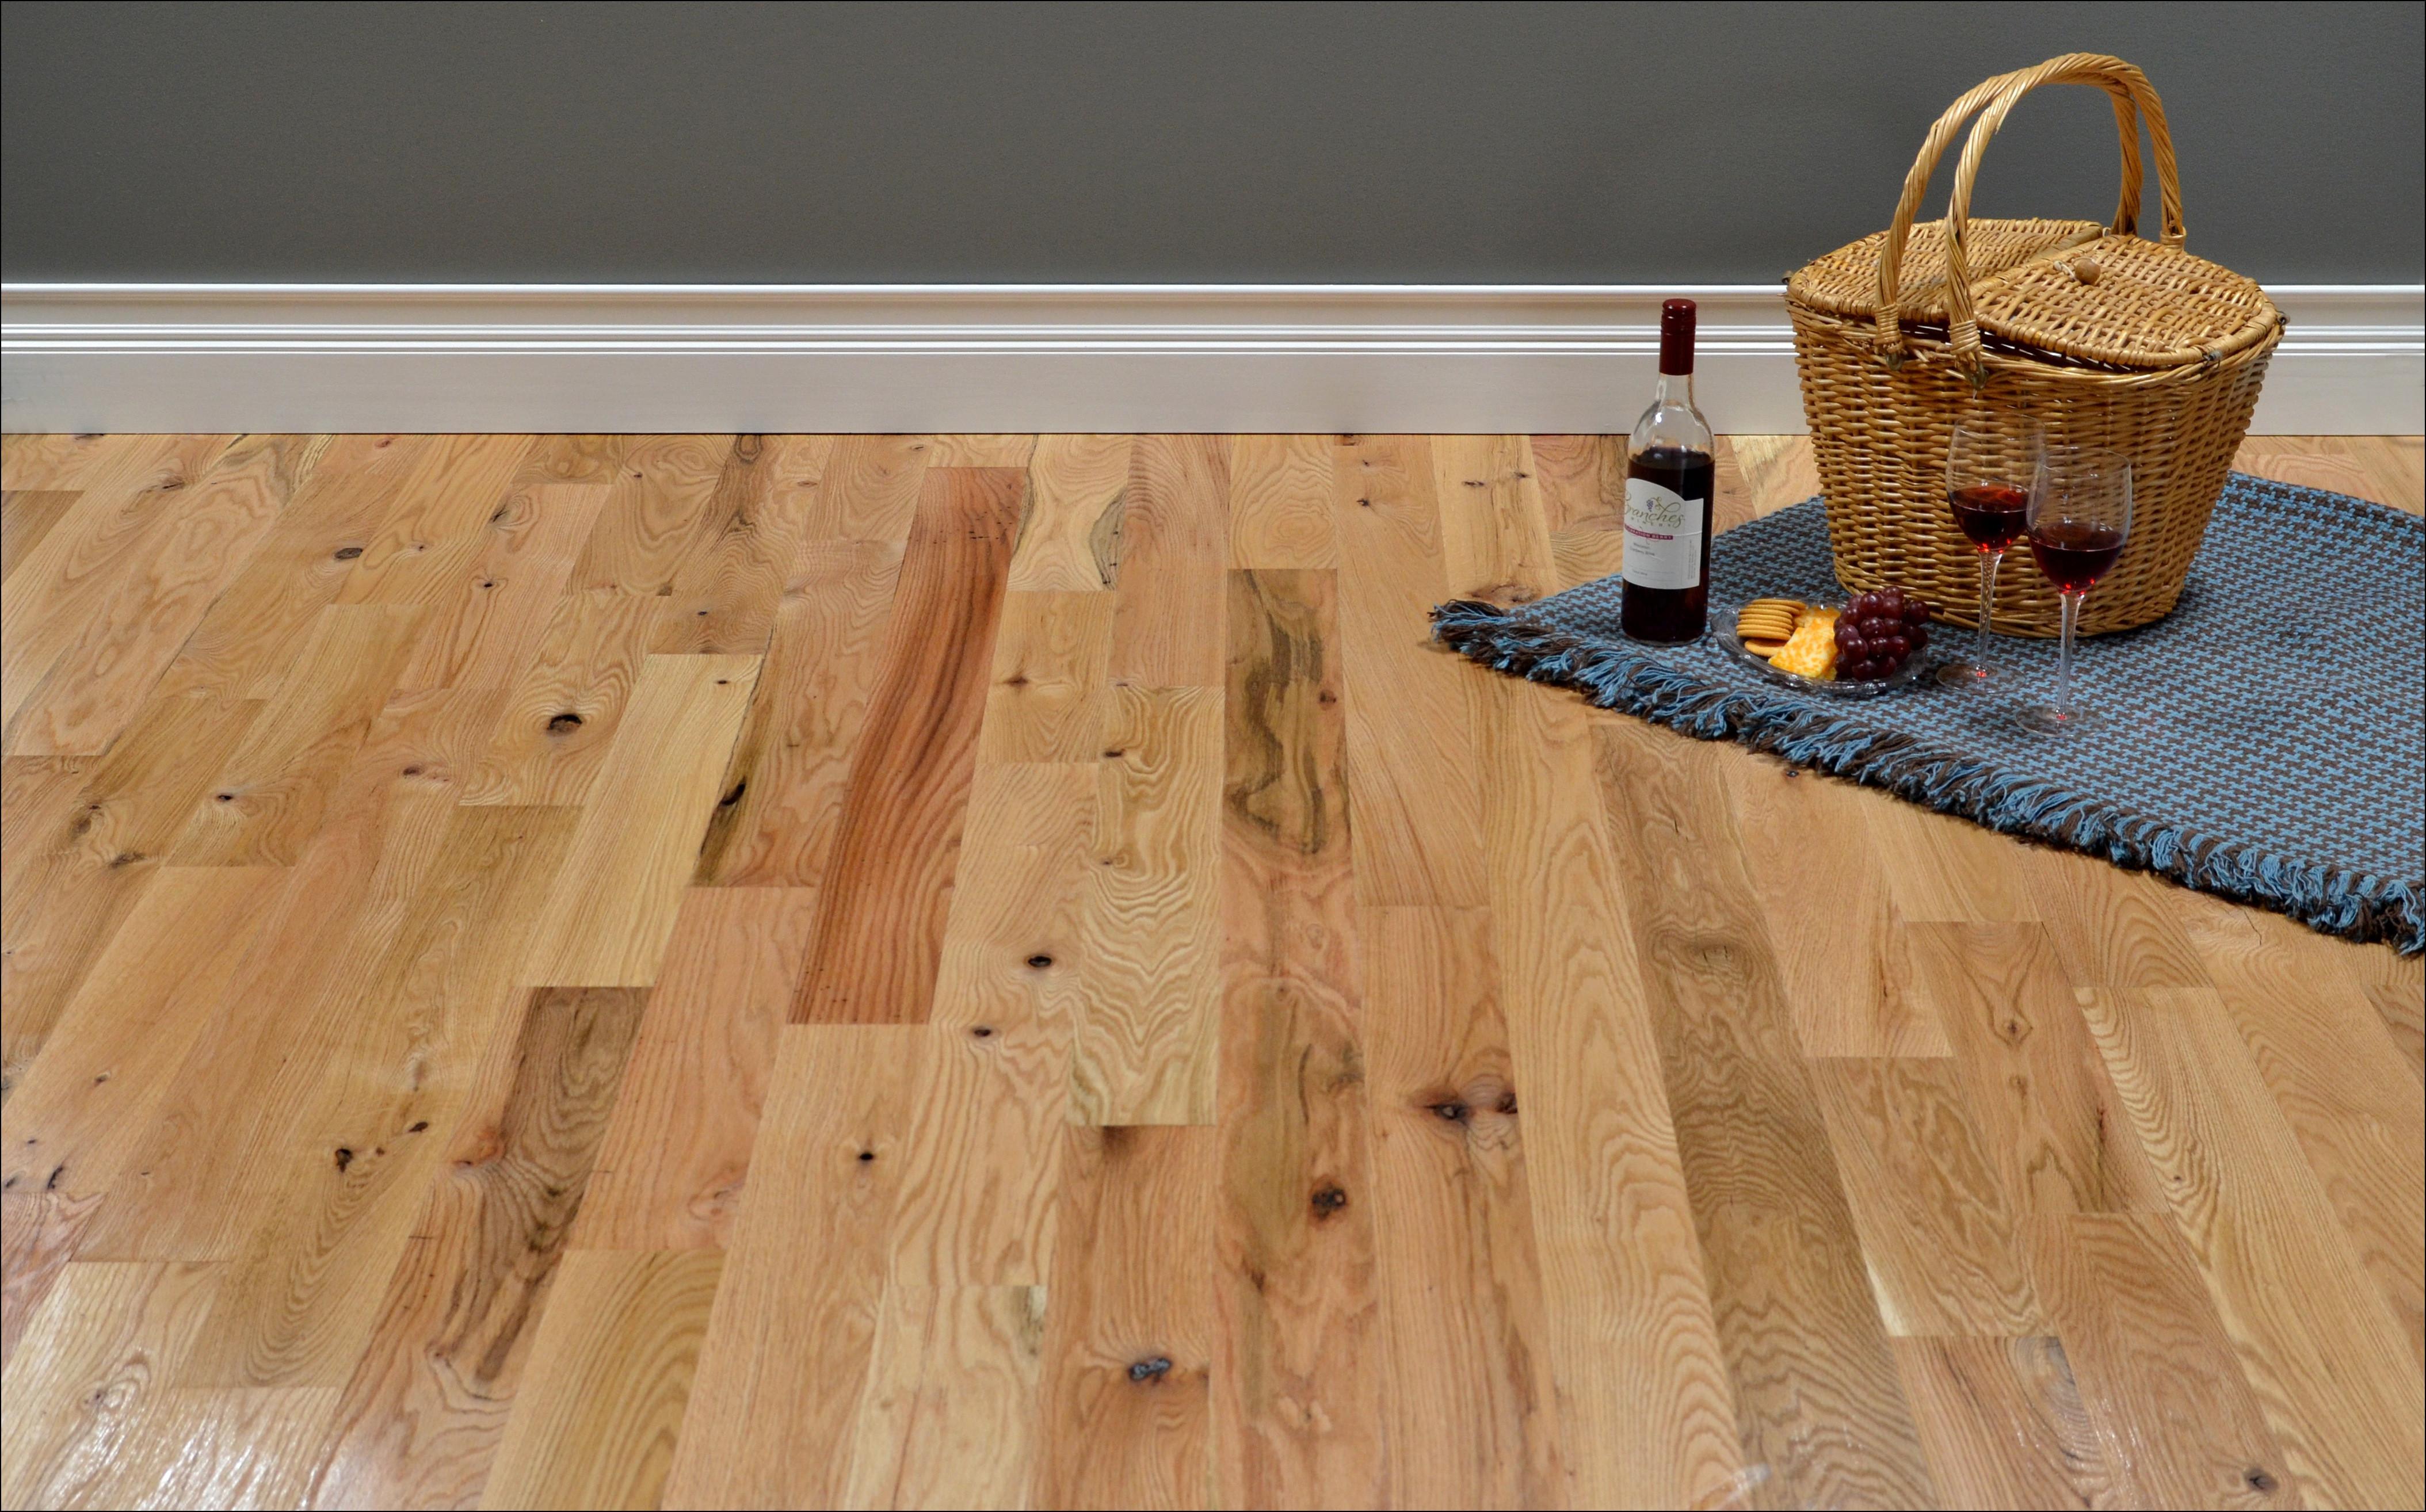 cheap hardwood flooring uk of 2 white oak flooring unfinished 2 mon red oak lacrosse flooring pertaining to 2 white oak flooring unfinished 2 mon red oak lacrosse flooring